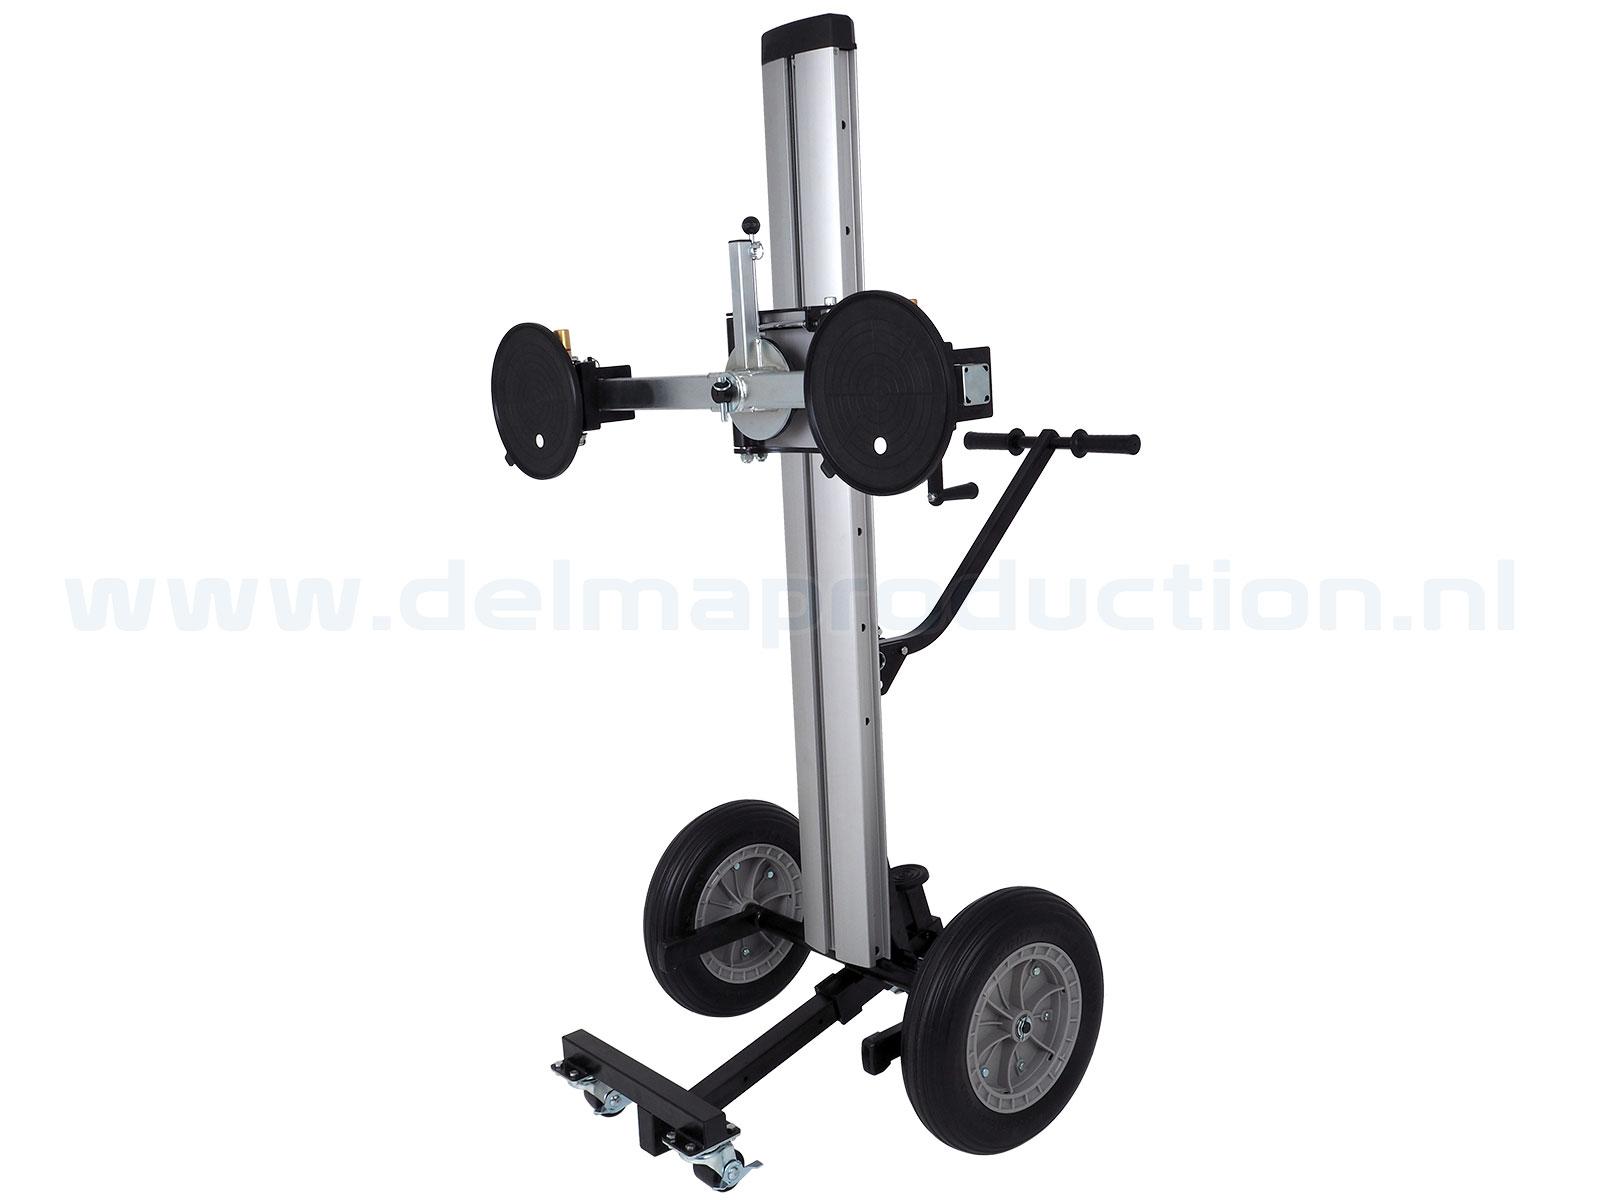 Glas transport- en montagelift Max. hoogte: 1,60 m Gewicht: 49 kg Wielen: 4 stuks (2 geremd) Vloeroppervlak: 1,4 x 1,4 m Draagvermogen: 180 kg (3)